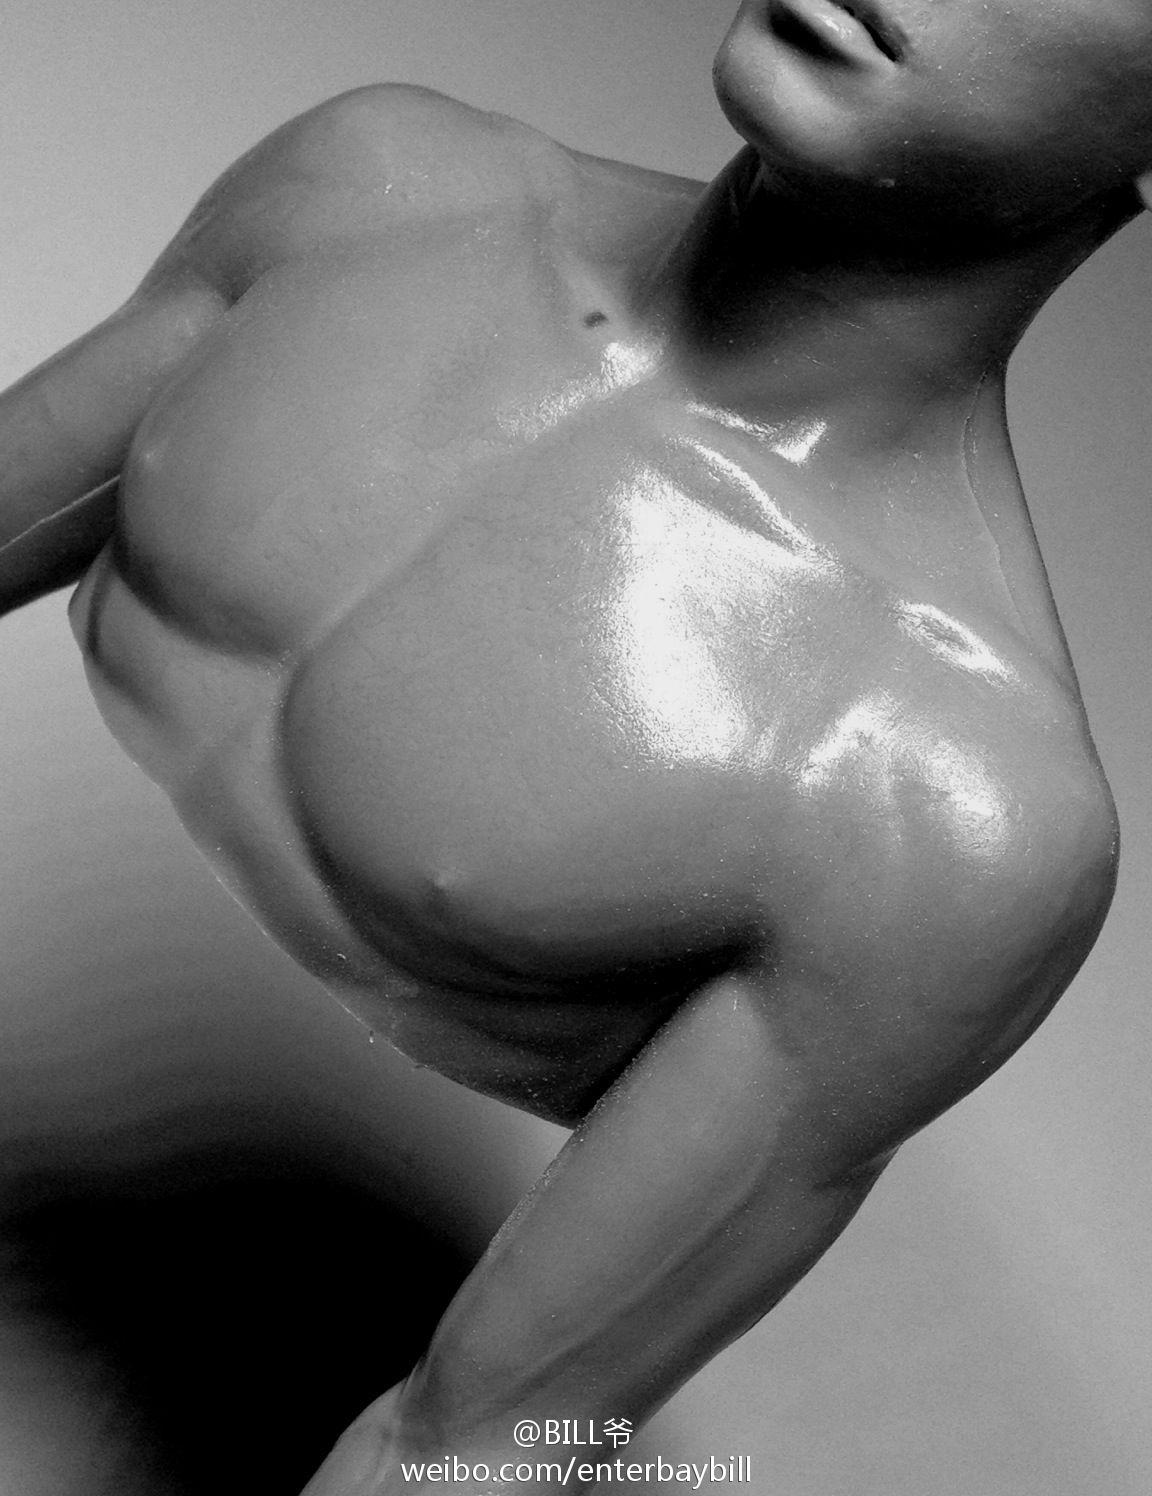 [Enterbay] Men In Black 1:6 Real Masterpiece figure - Página 2 69464edejw1dq0s76o3tnj